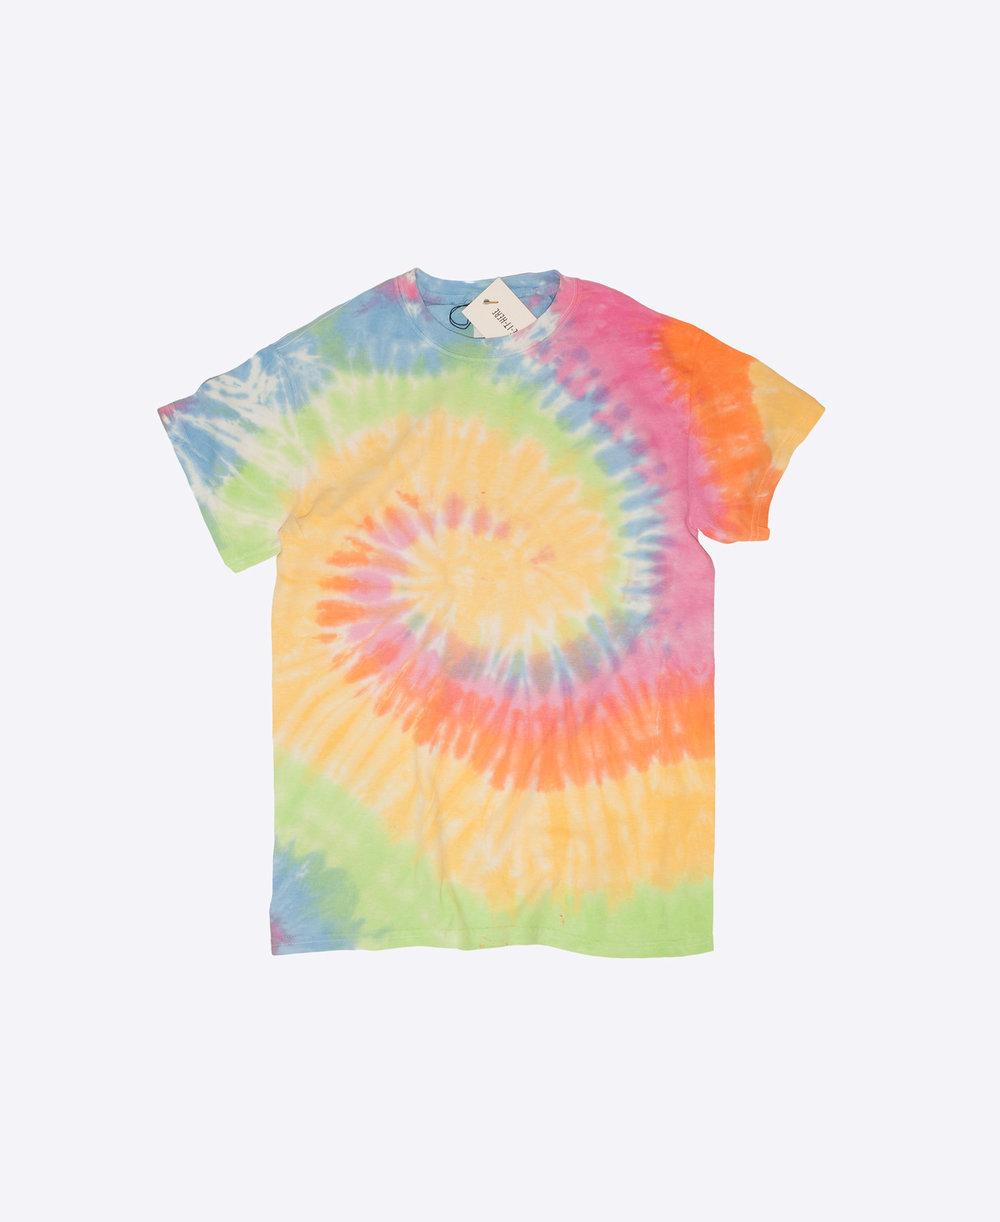 tiedye-unisex-t-shirt.jpg